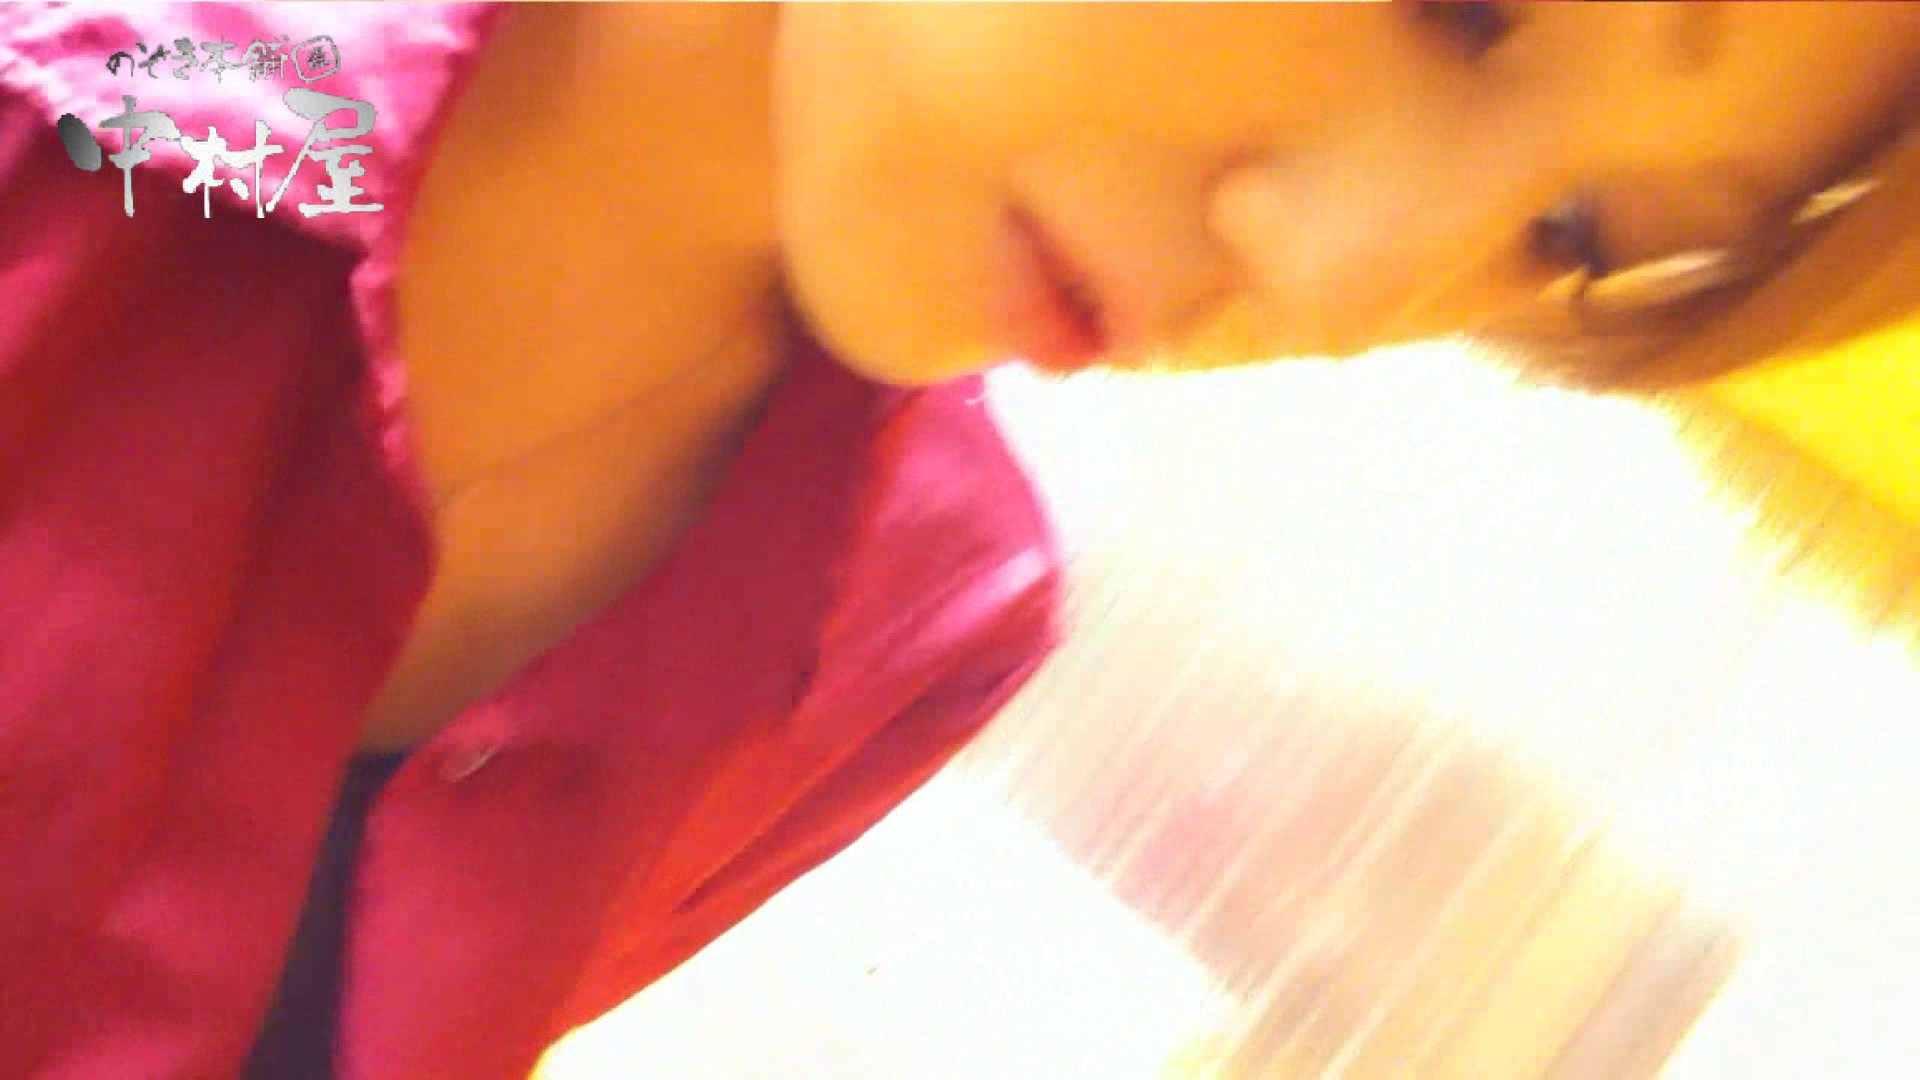 vol.48可愛いカリスマ店員胸チラ&パンチラ アニメ声の店員さん 胸チラ  96Pix 47